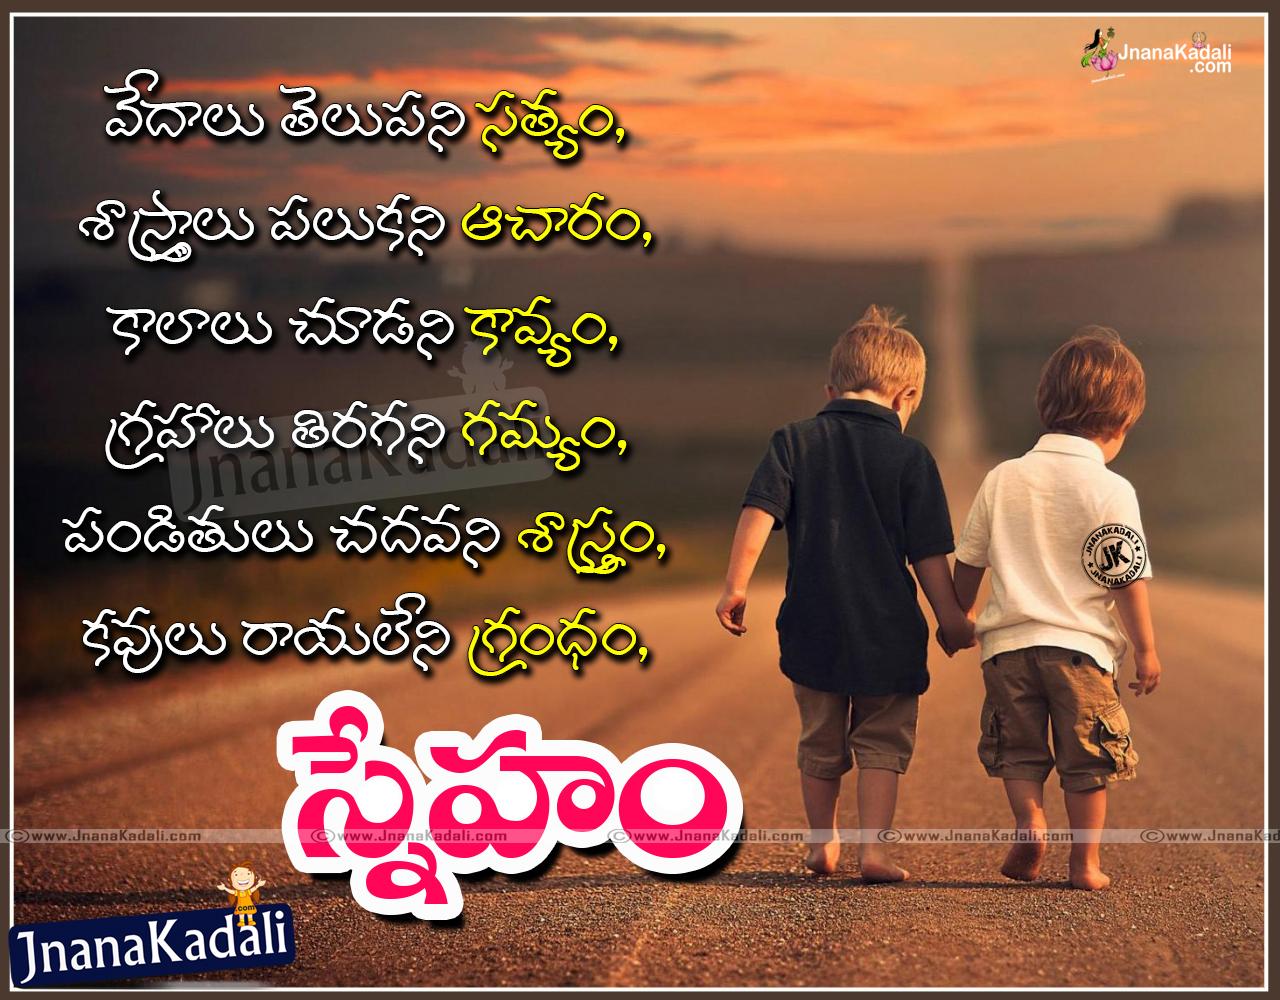 Original Quotes About Friendship In Telugu Mesgulsinyali